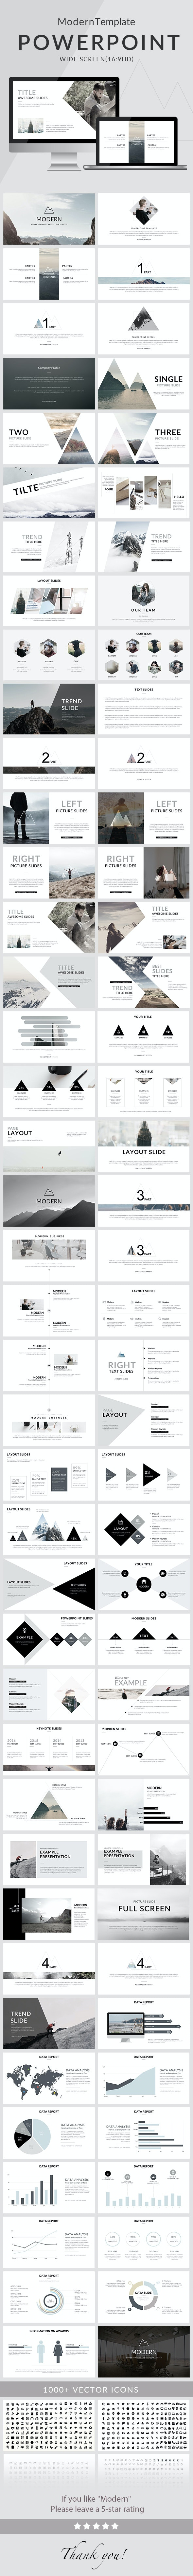 Modern - Powerpoint Template - Creative PowerPoint Templates